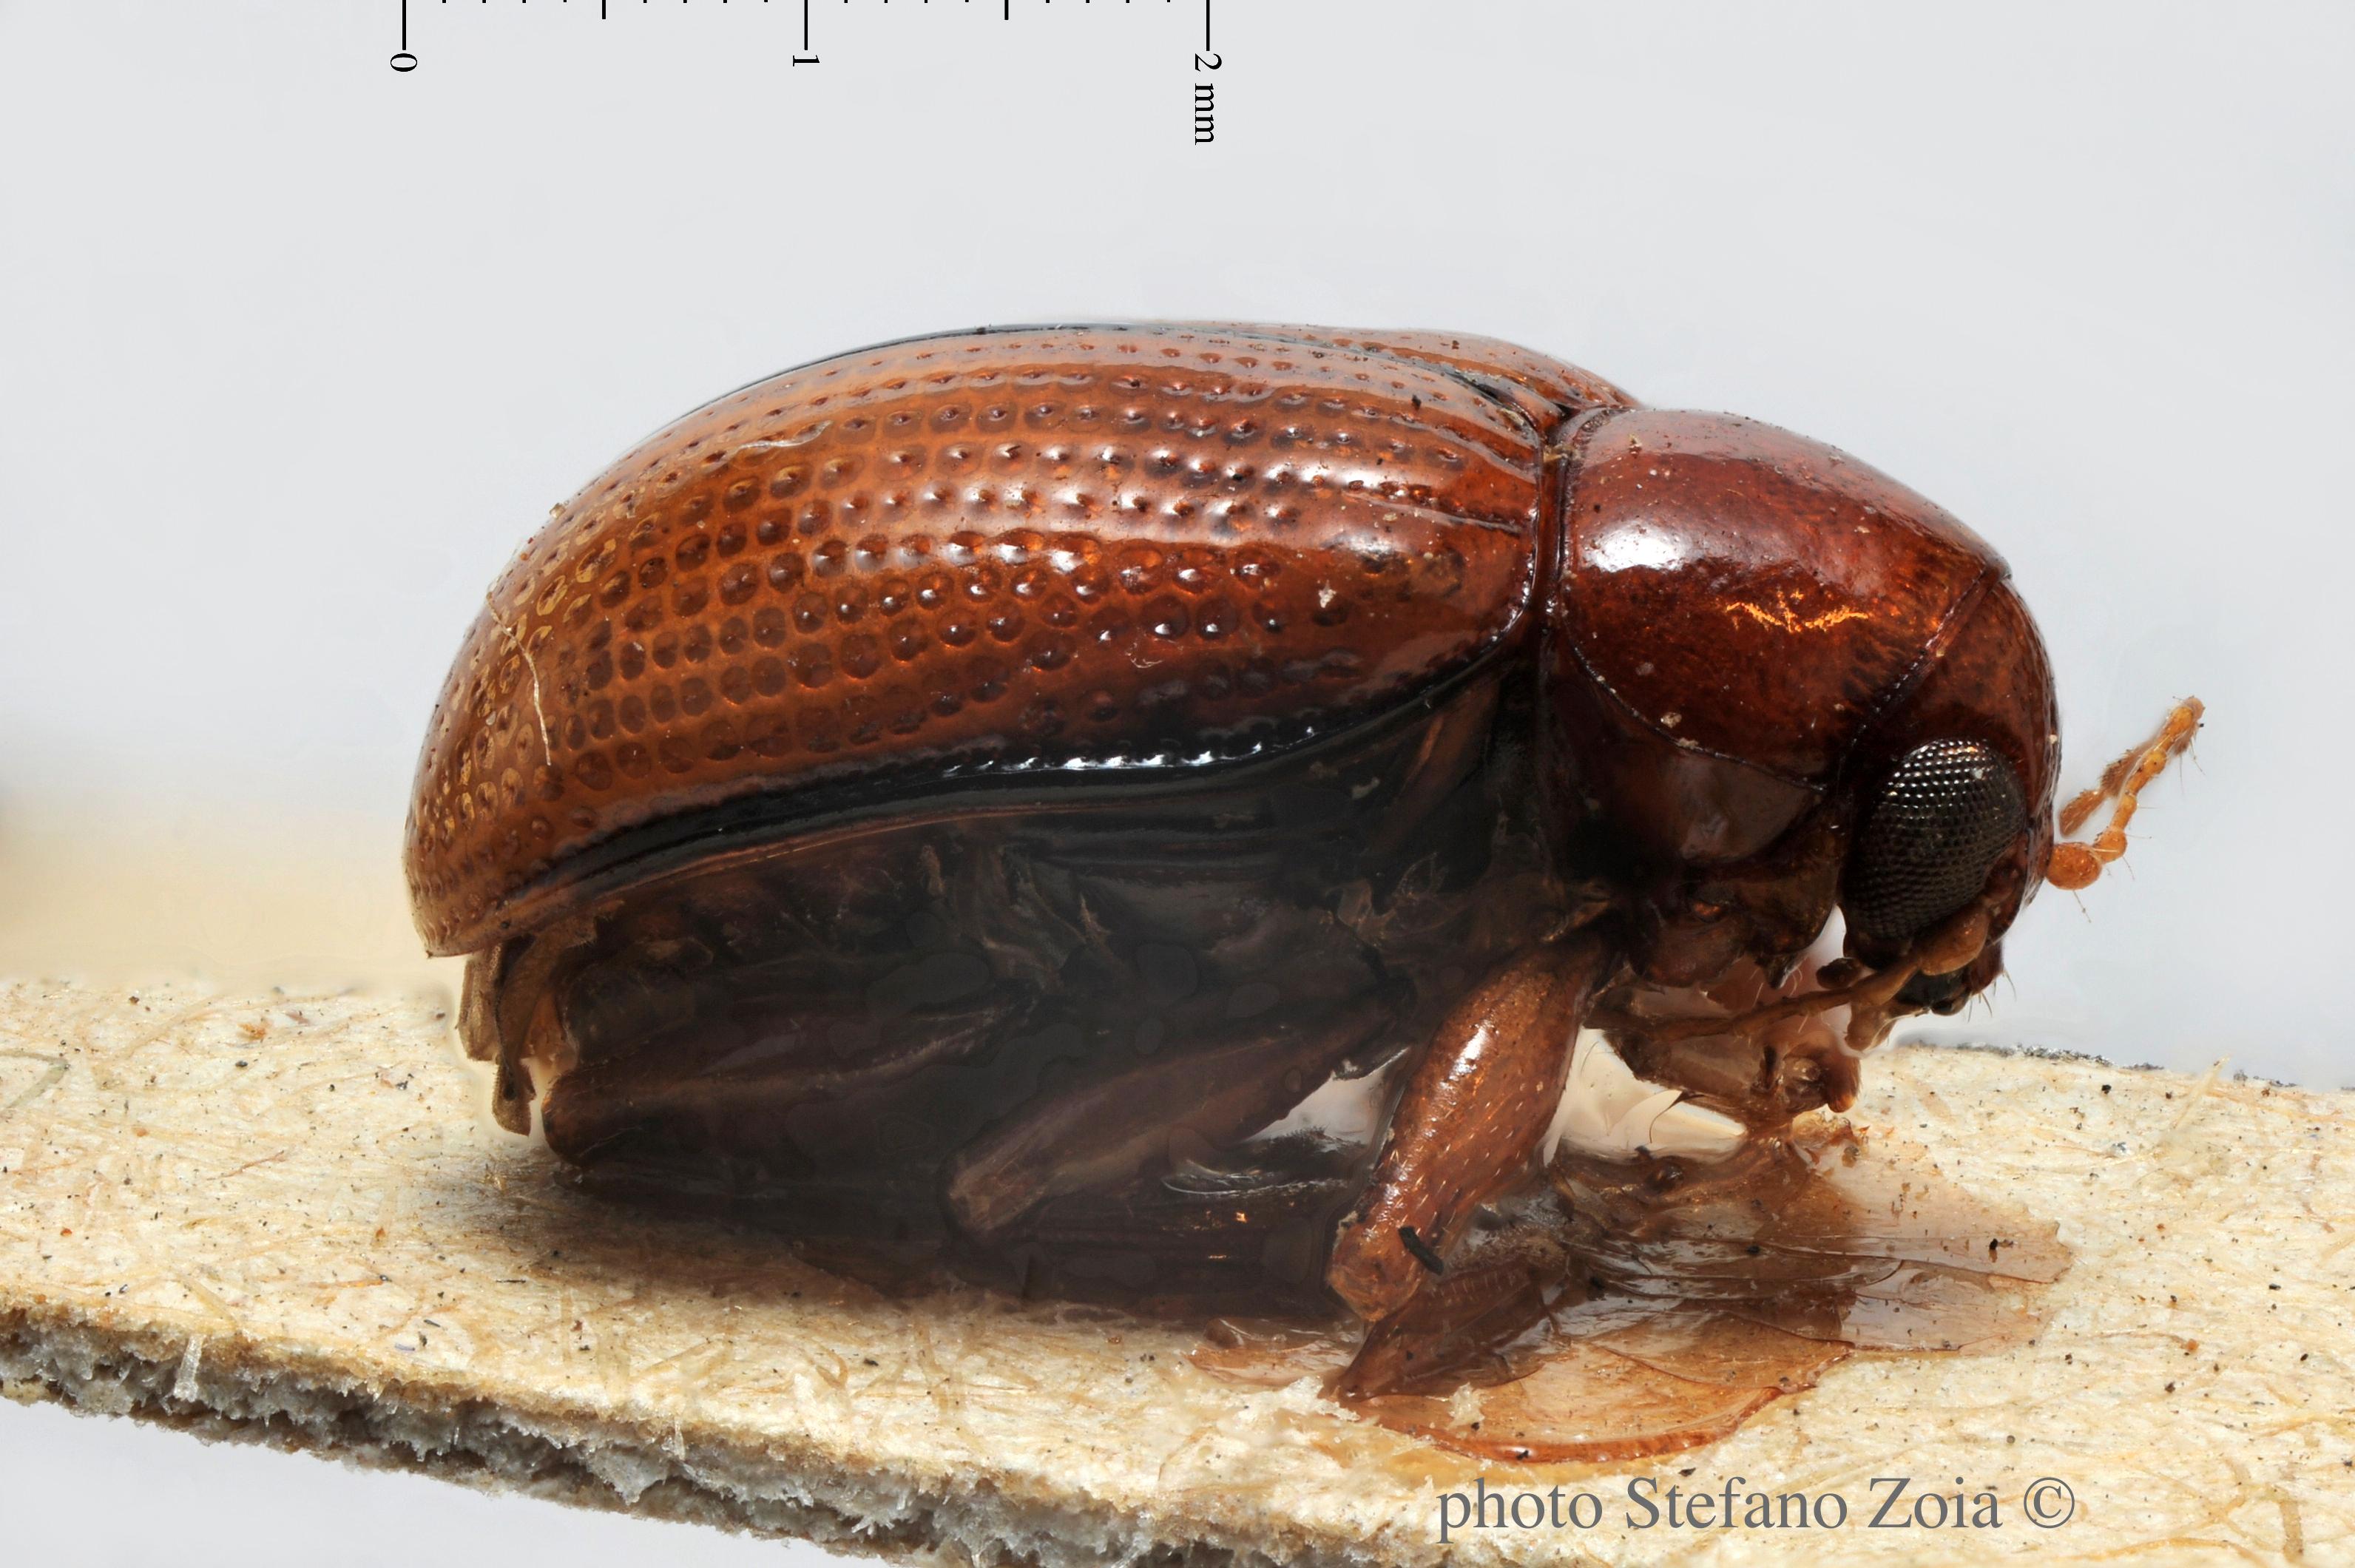 BE-RBINS-ENT Afroeurydemus marginatus 1 - 7297 - 7328.JPG